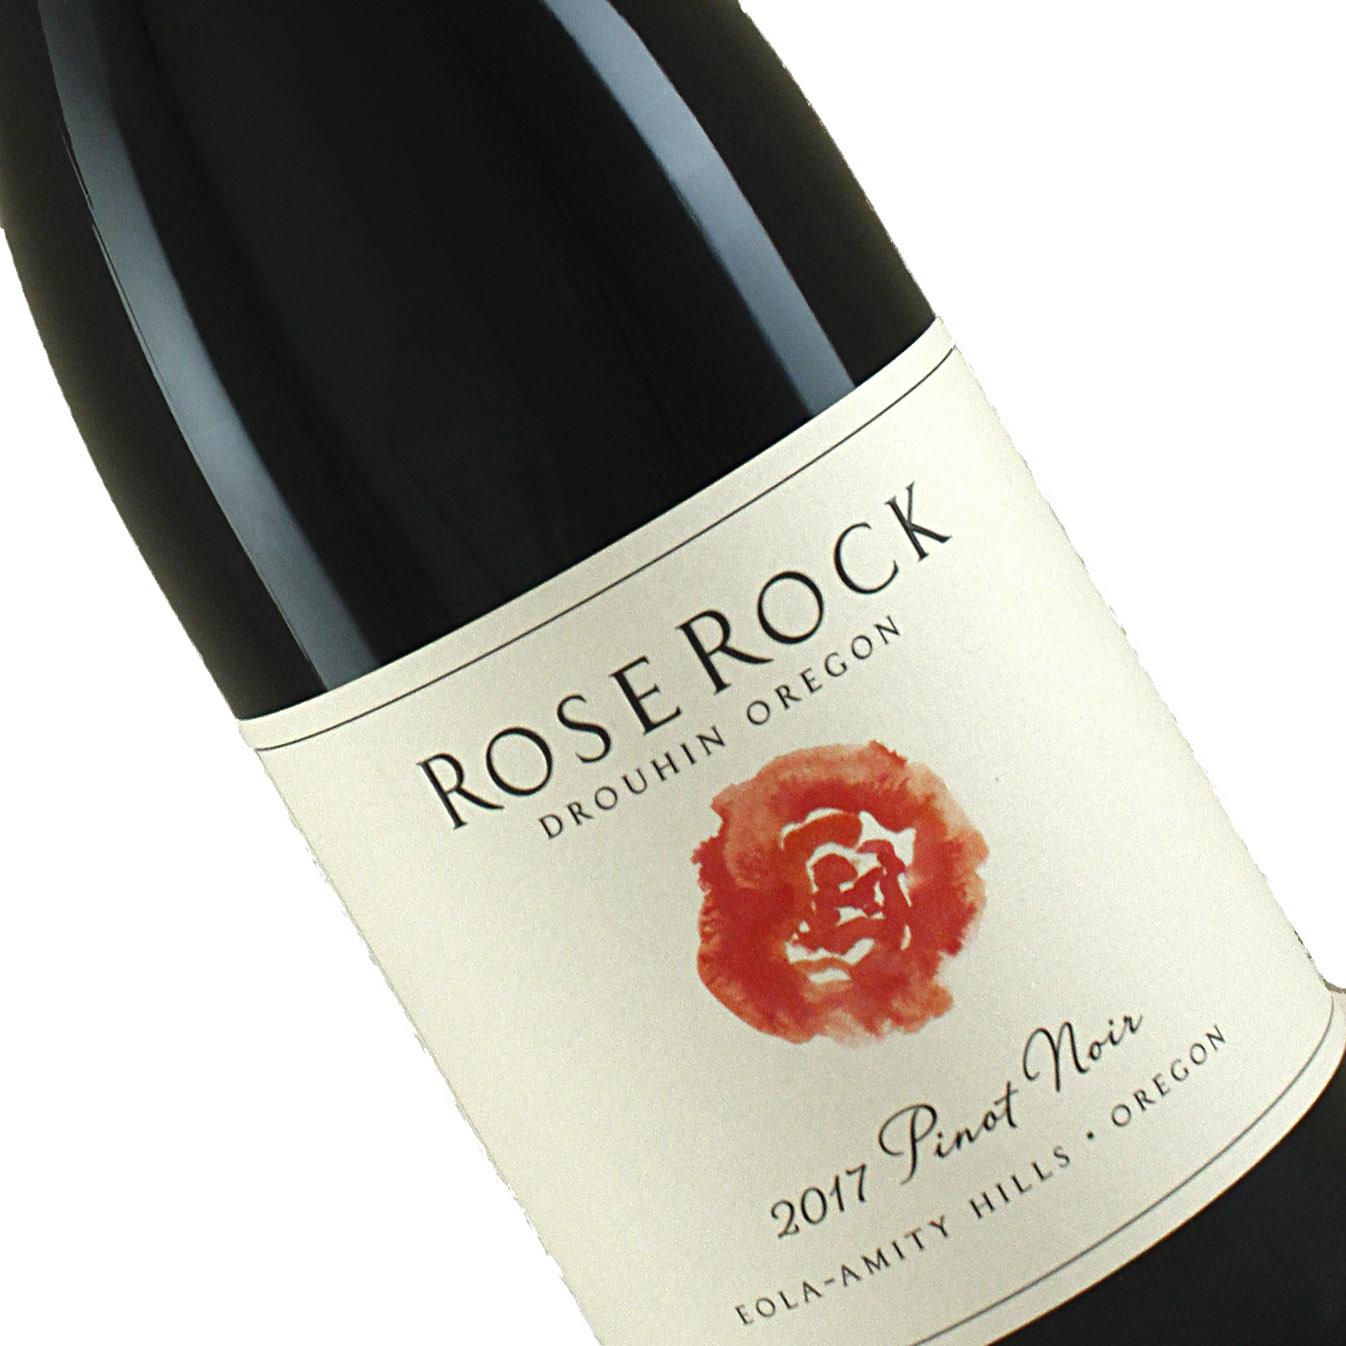 RoseRock by Domaine Drouhin 2018 Pinot Noir Eola-Amity Hills, Oregon